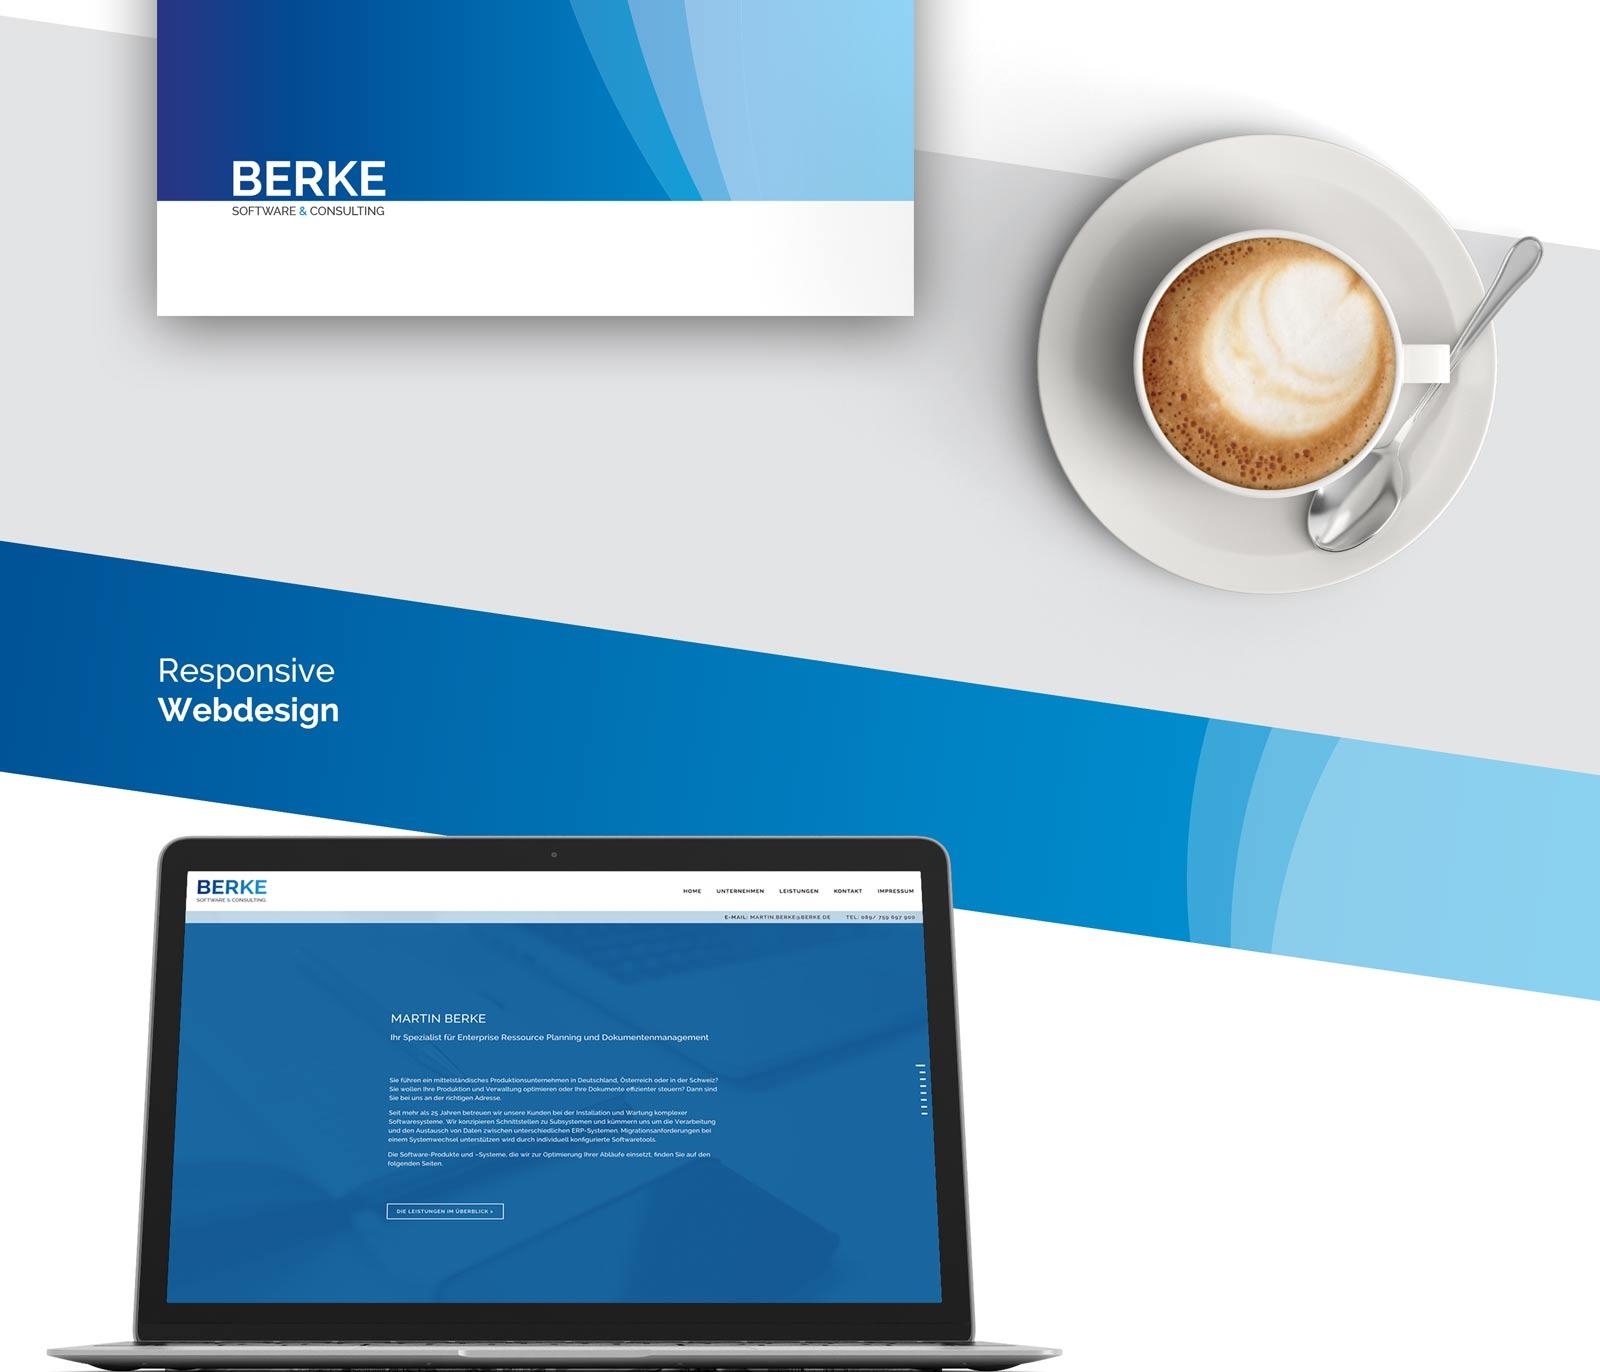 Berke_IT_Corporate_Design_Responsive_Webdesign_5.jpg